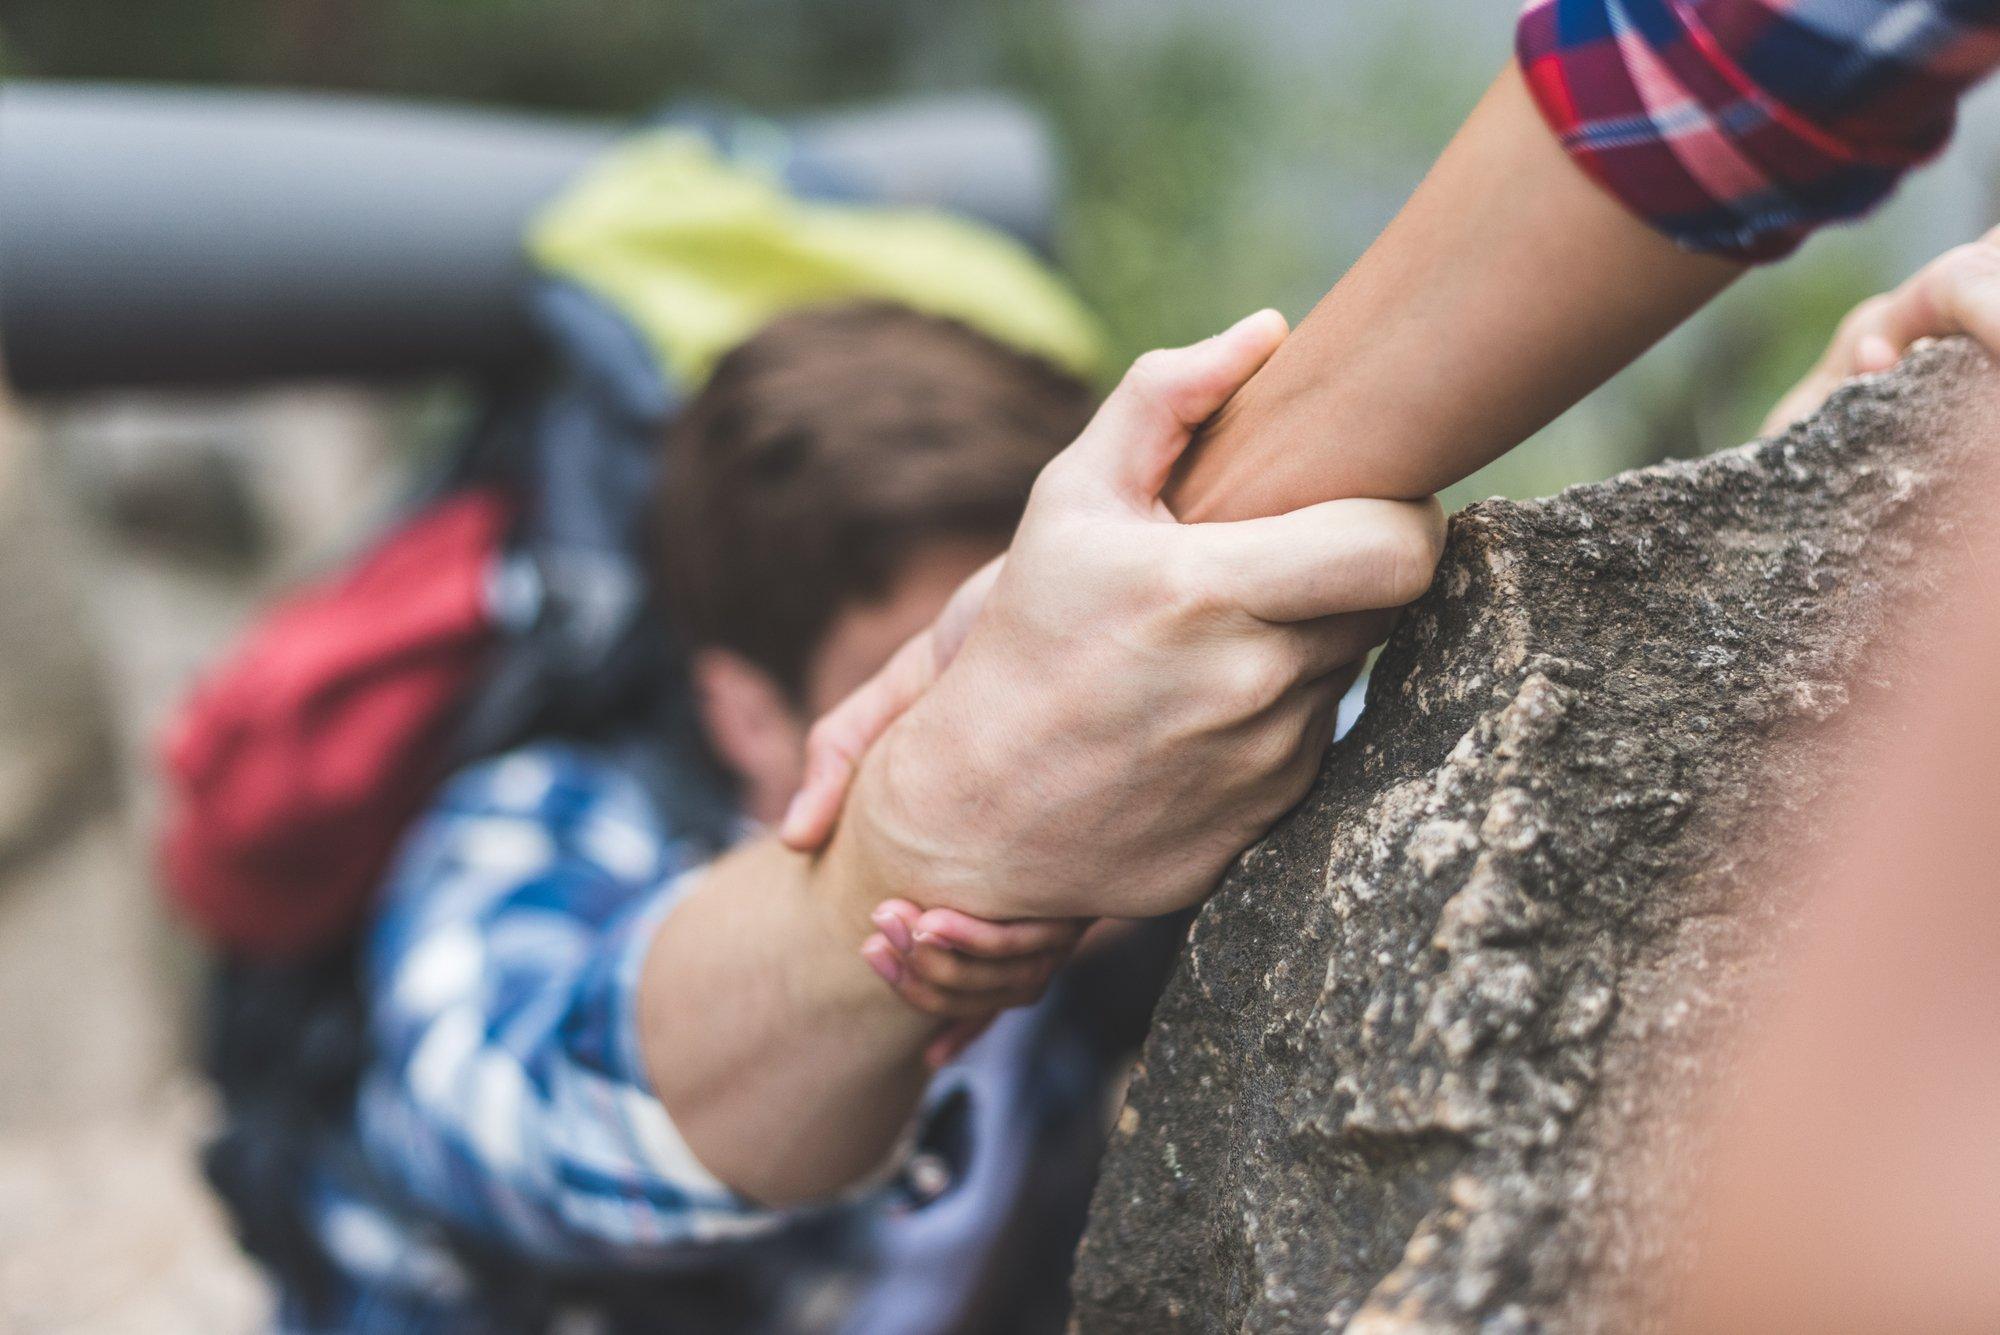 Woman helping boyfriend to climb rock